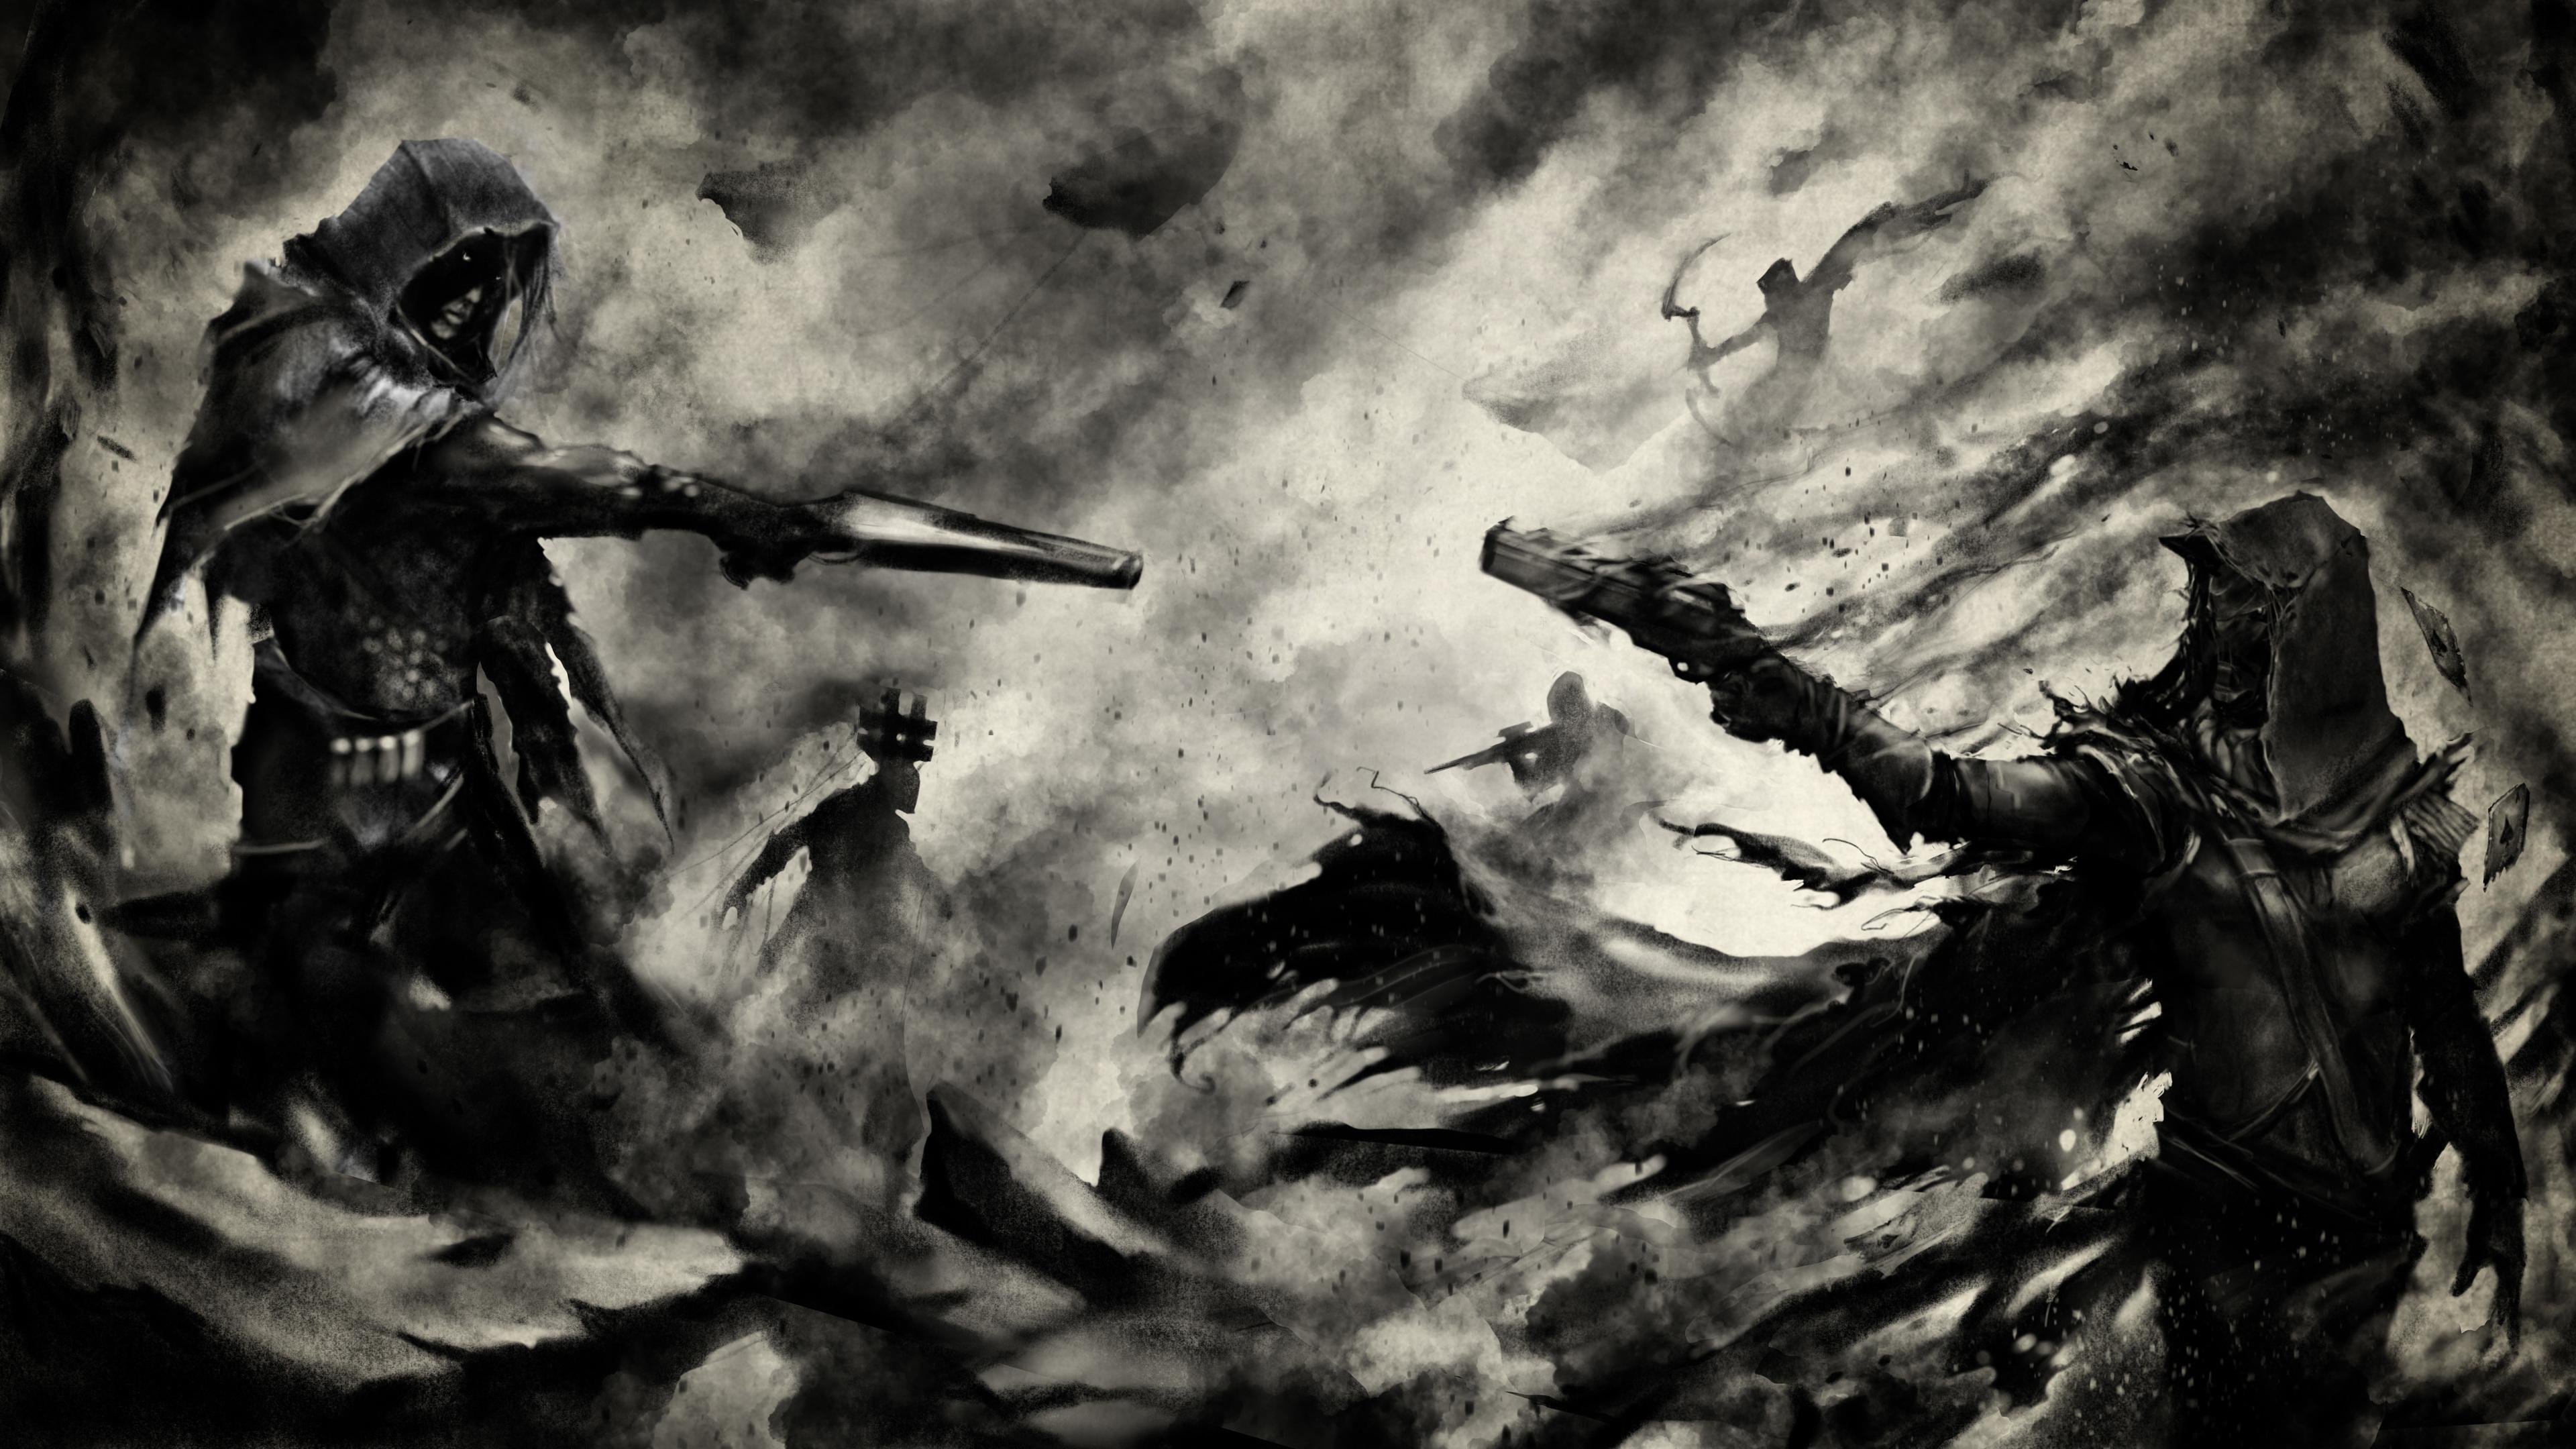 Destiny 2 forsaken ps4 official concept art hd wallpapers - 4k destiny 2 wallpaper ...